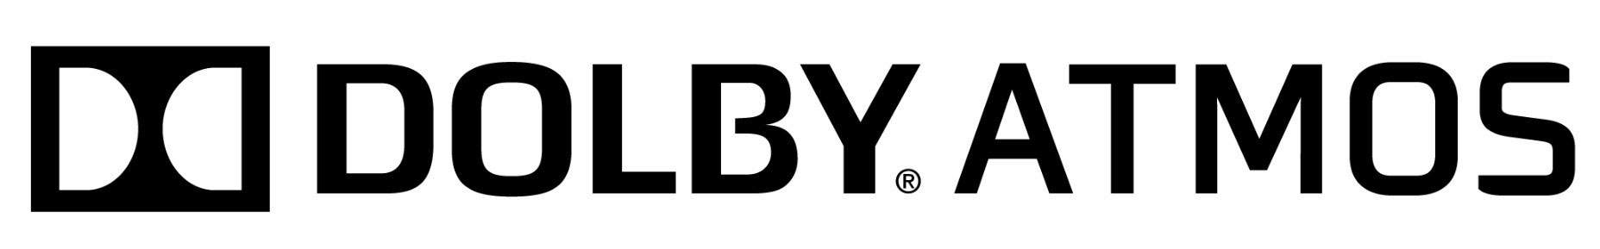 Ce inseamna Dolby Atmos?